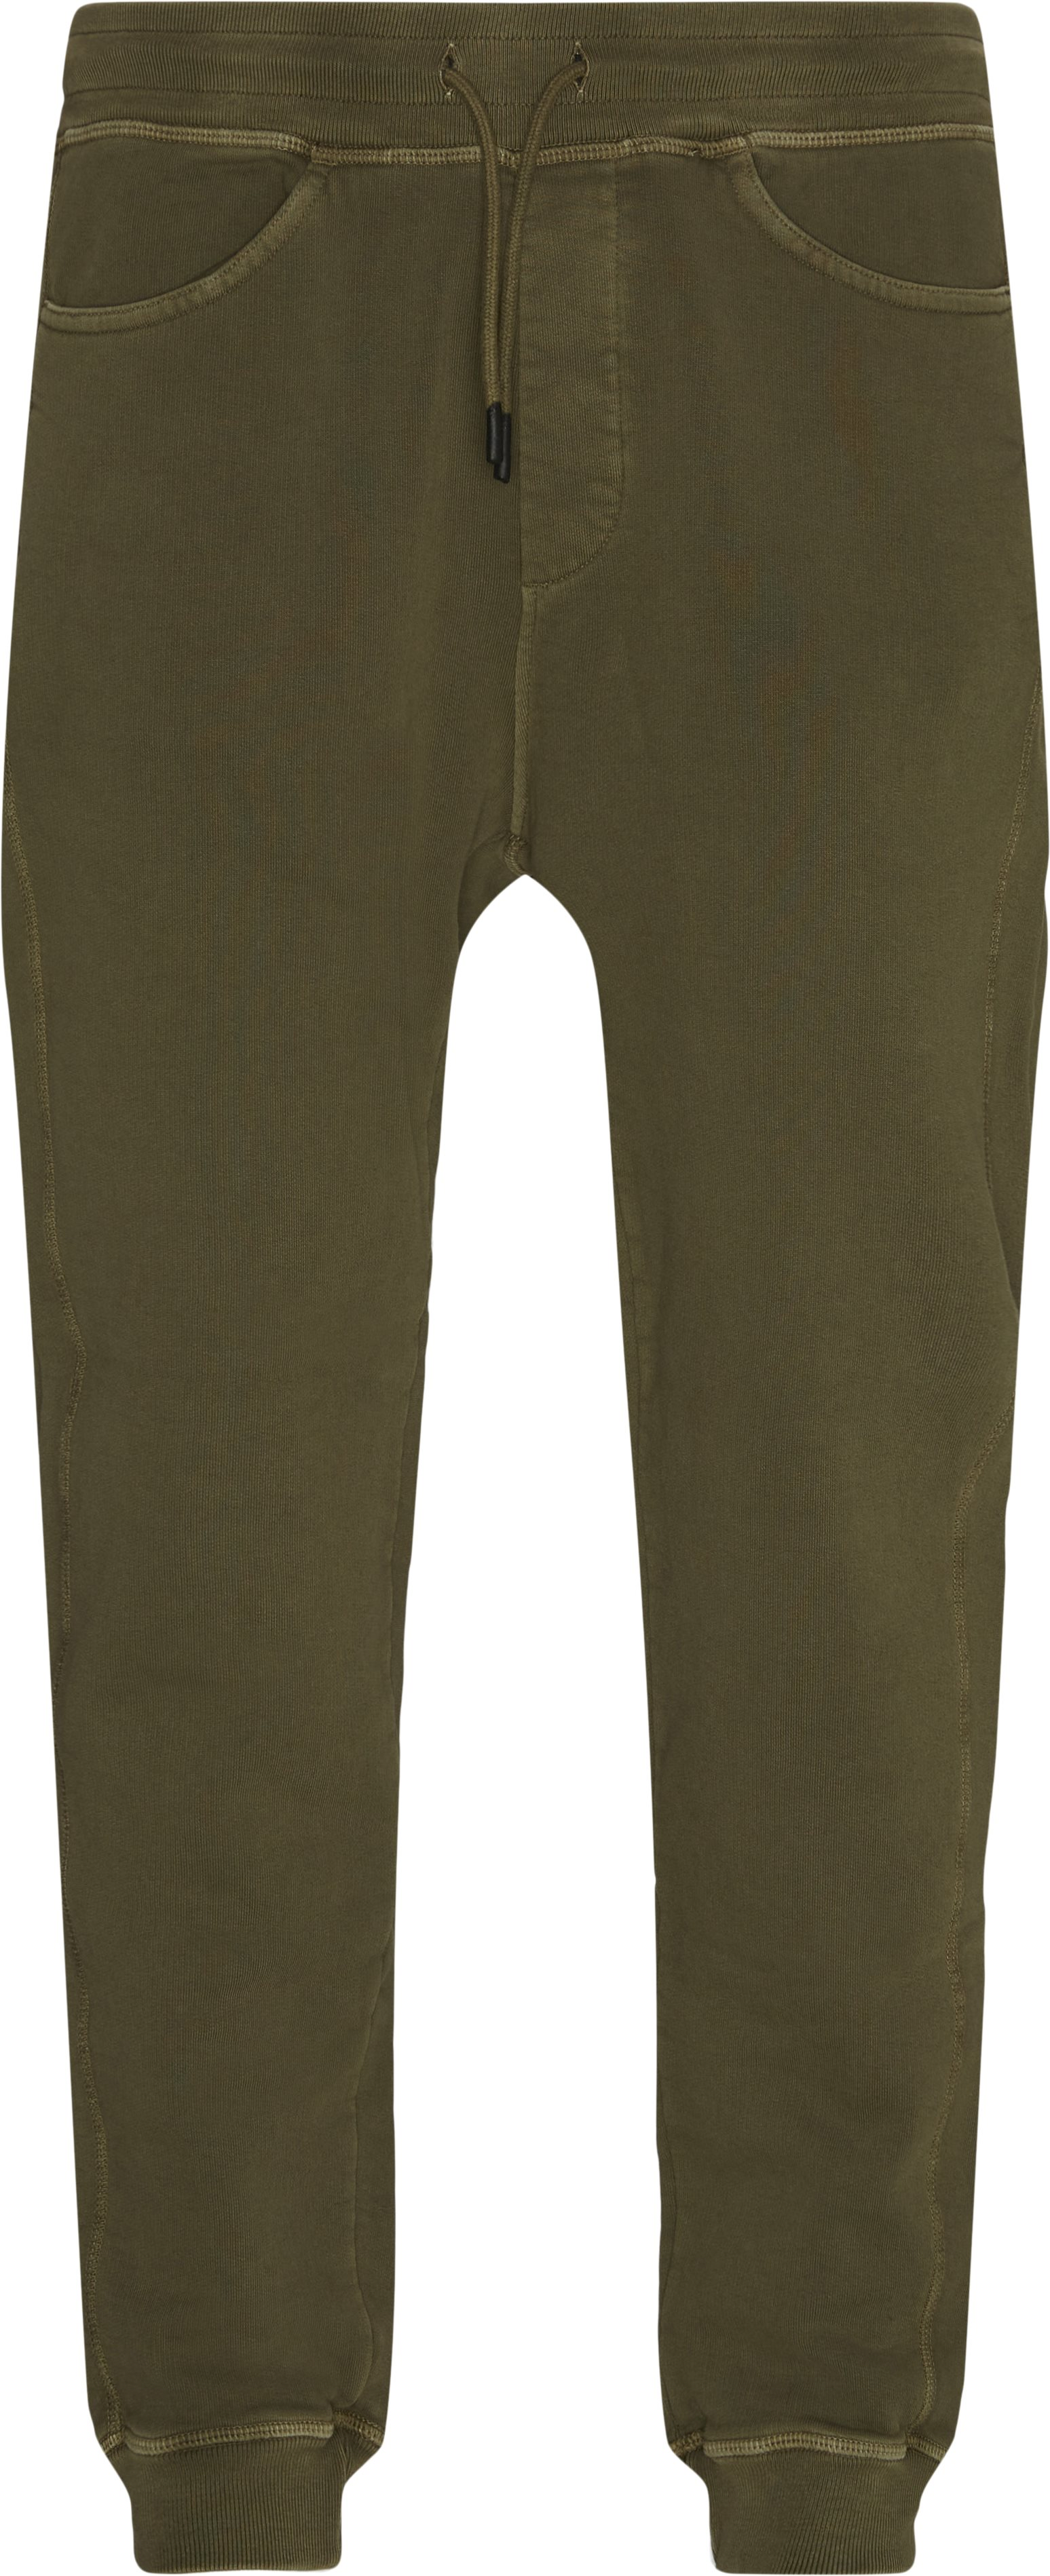 Sweatpants - Sweatshirts - Regular fit - Army